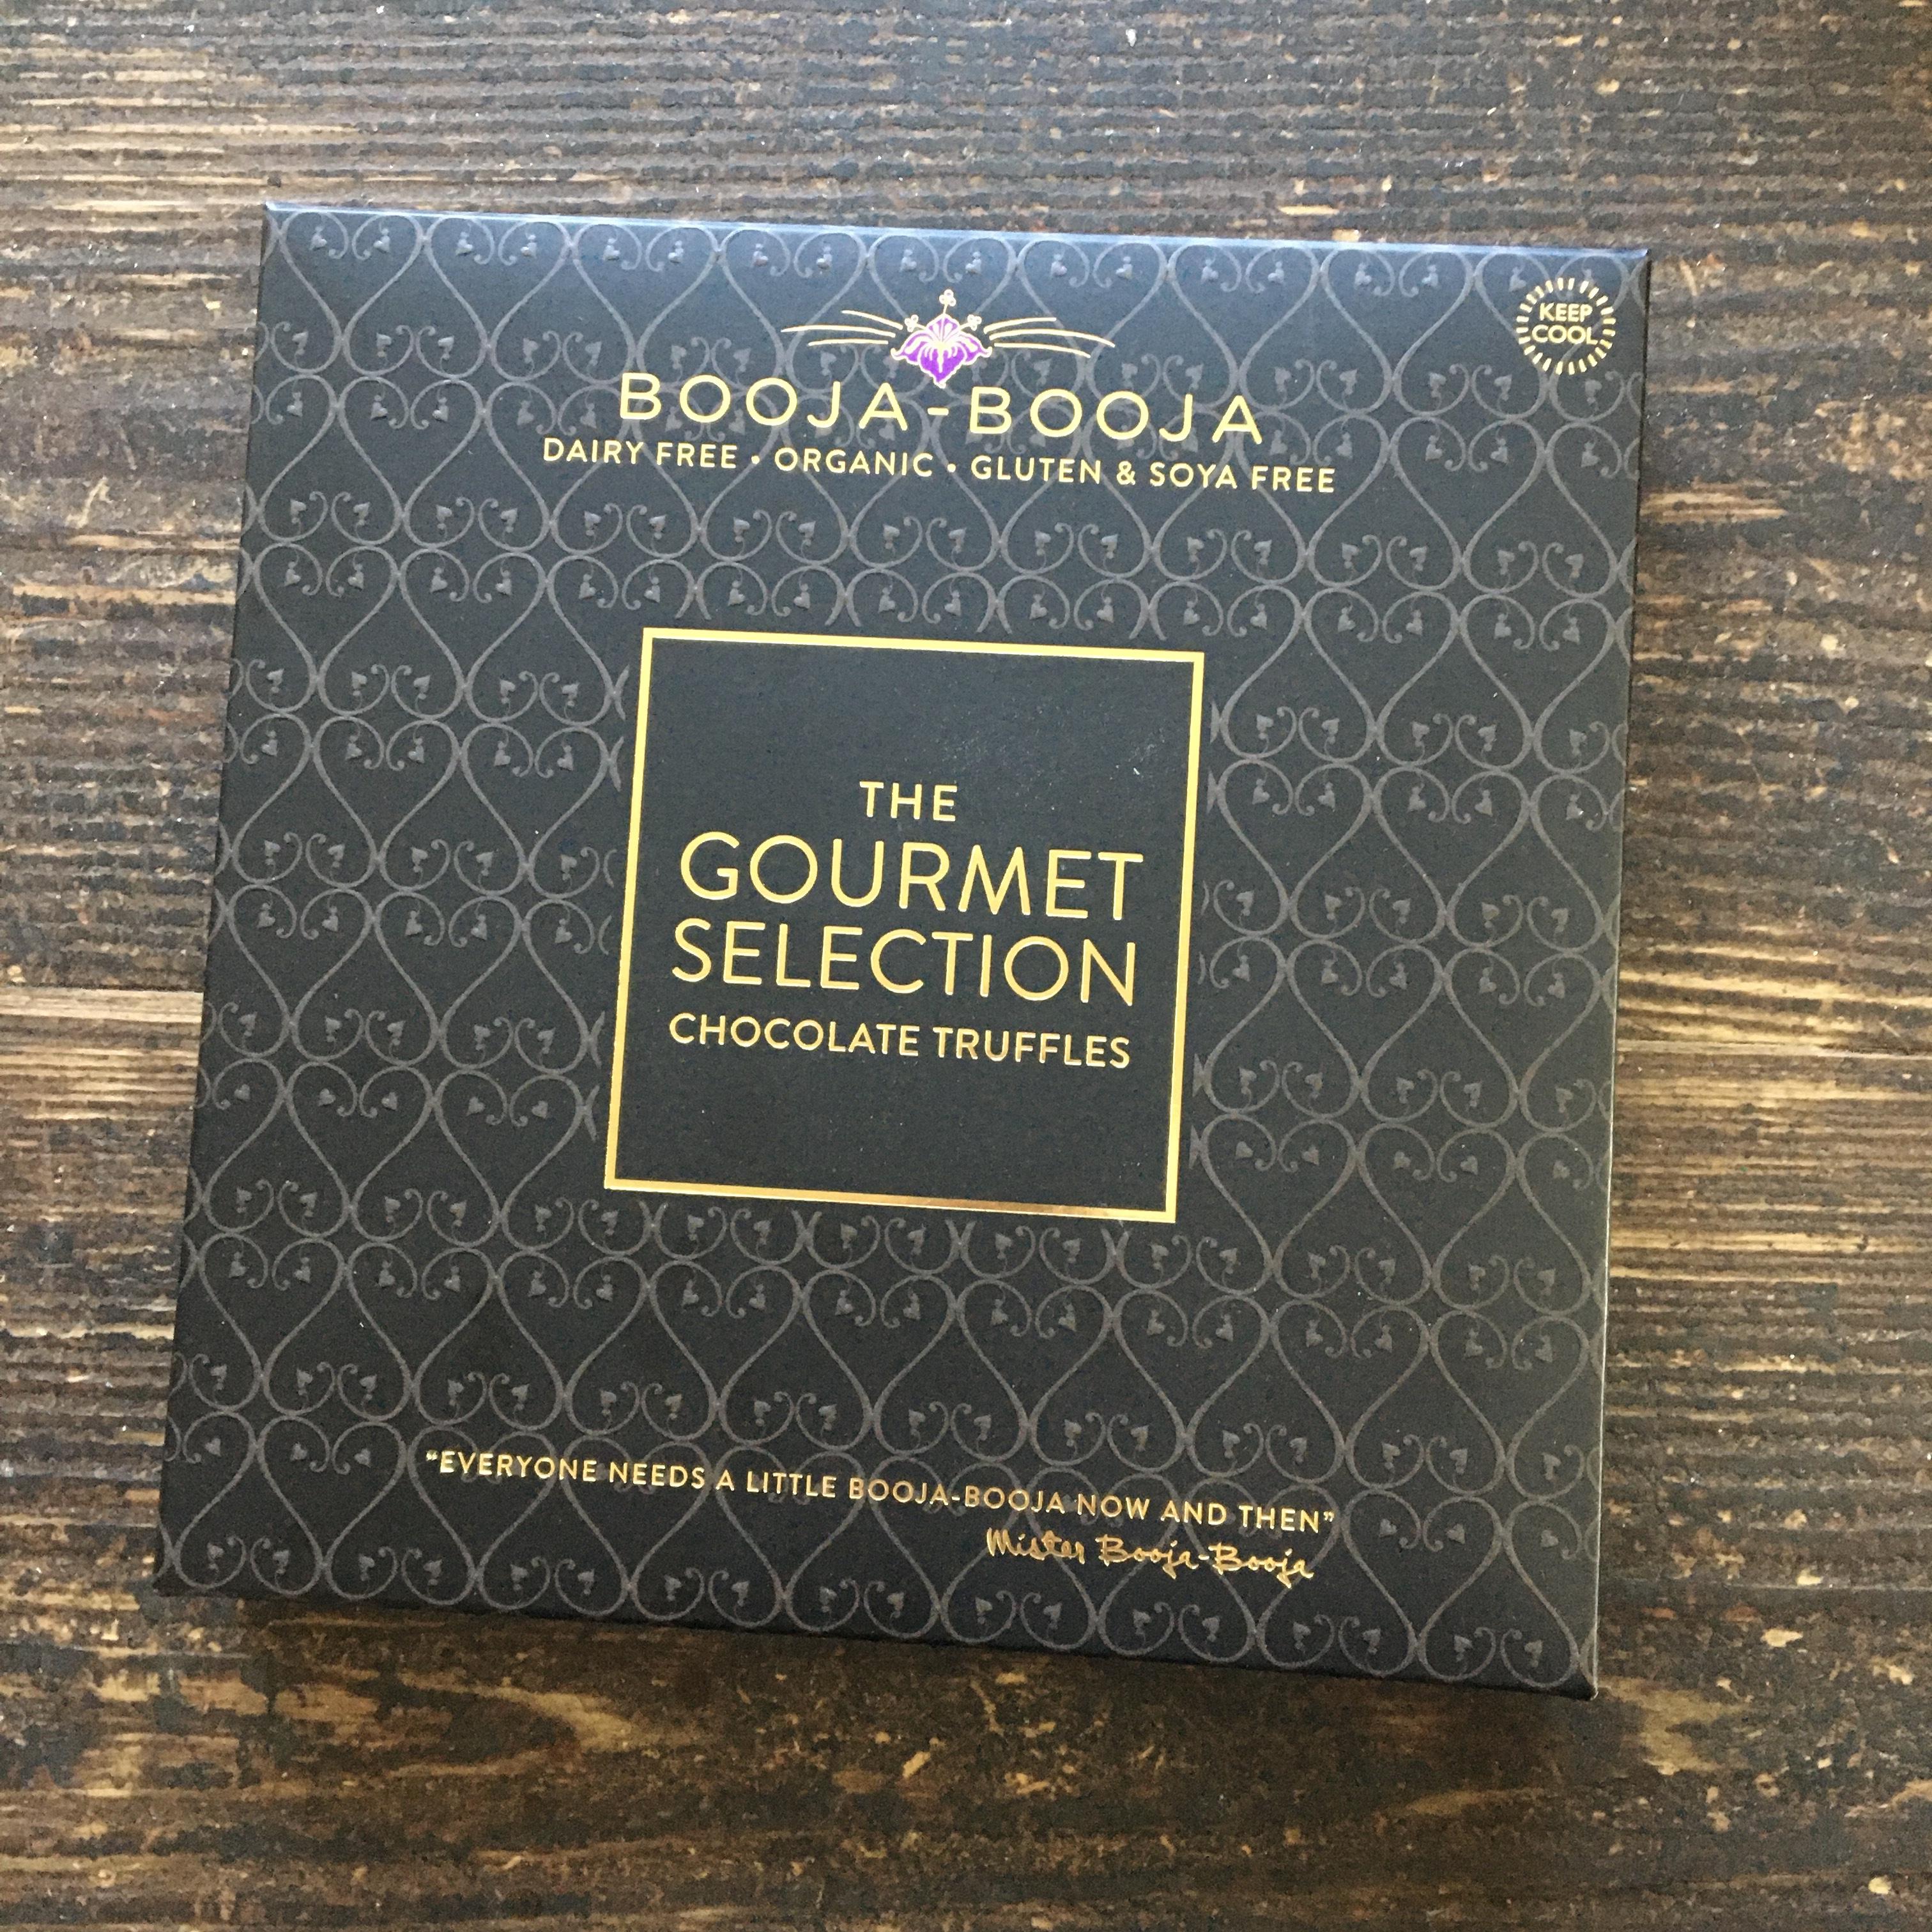 Booja Booja Gourmet Selection Truffles